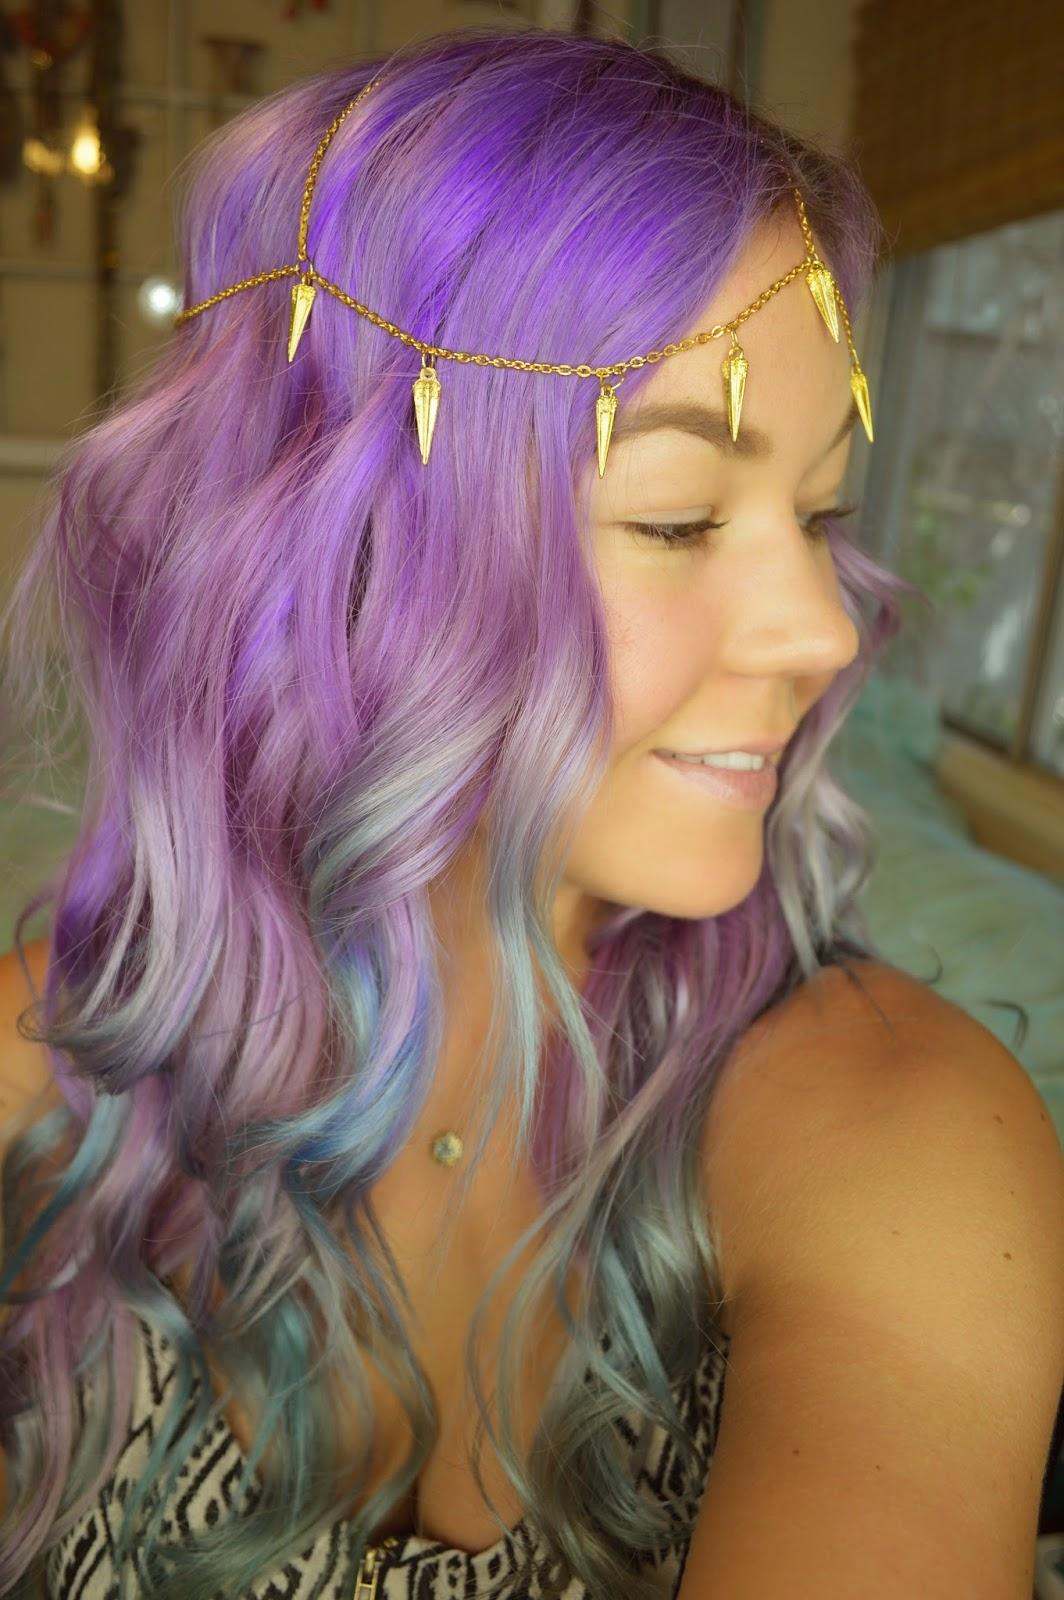 Marvelous Alexsis Mae How To Wear A Head Chain Short Hairstyles Gunalazisus